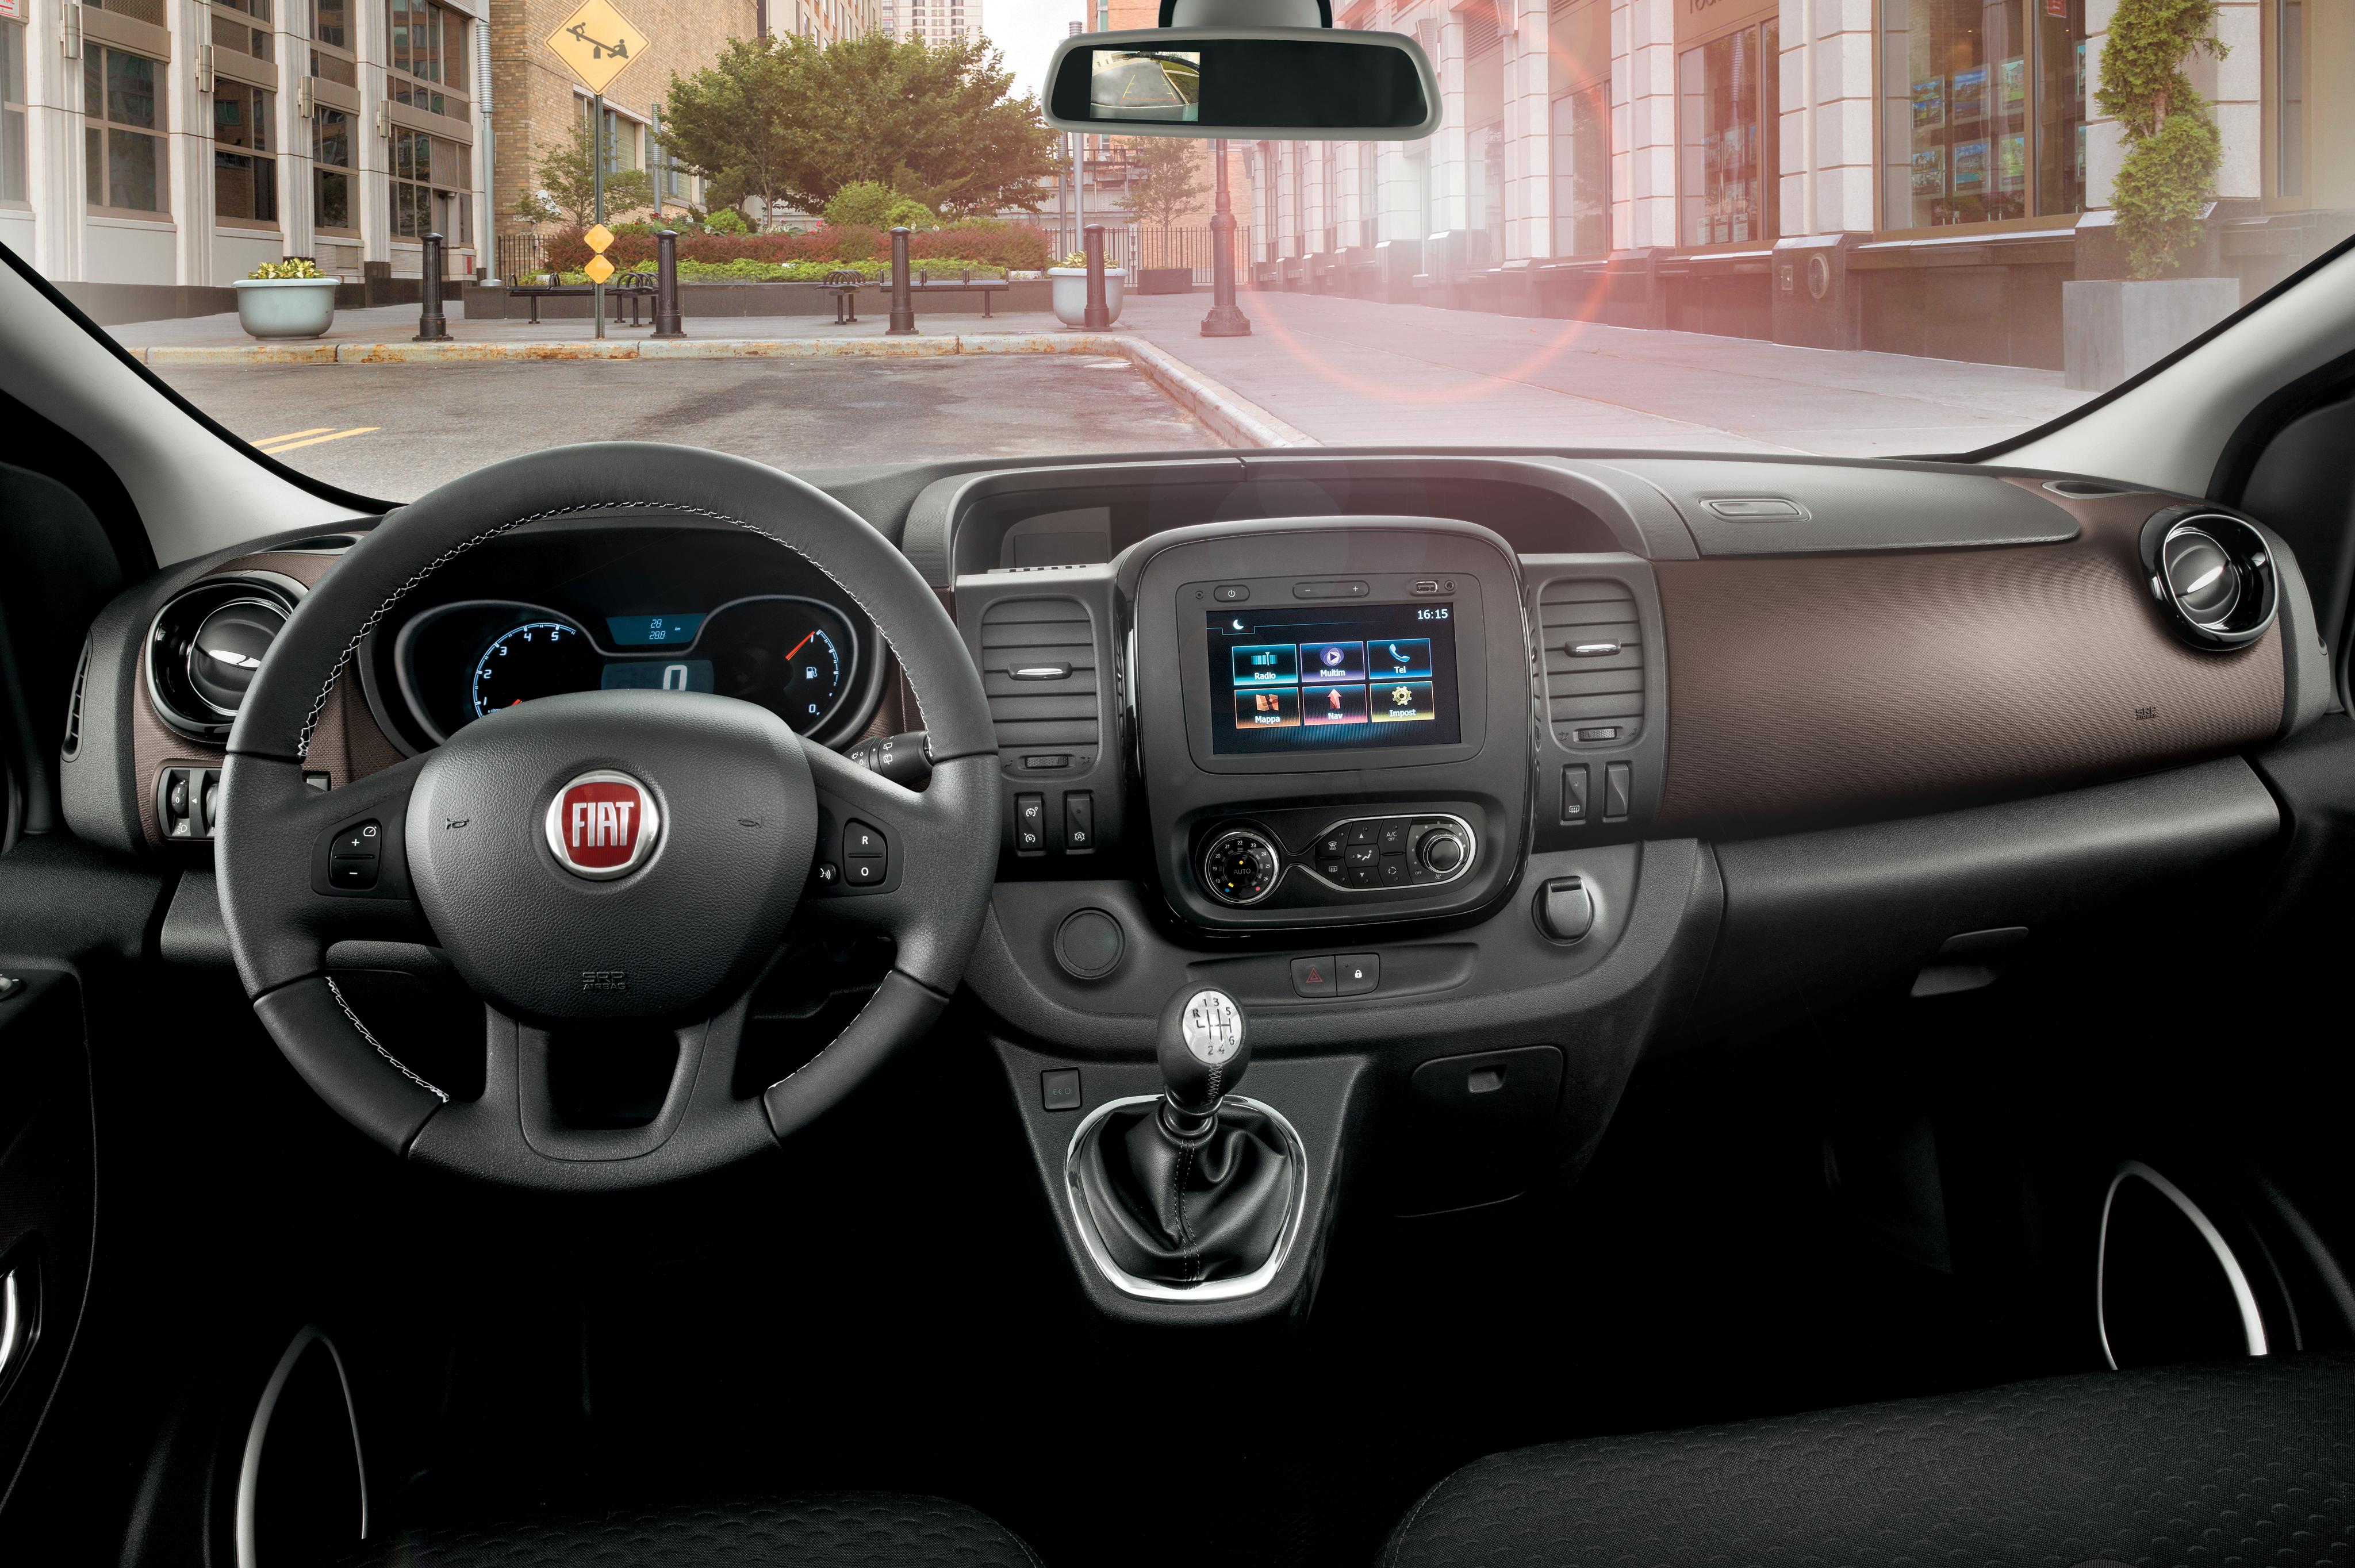 10 Passenger Van >> Fiat Contract Hire - Hire Purchase - Finance Lease - UK Deals   Talento 10 SWB Diesel 1.6 Ecojet ...